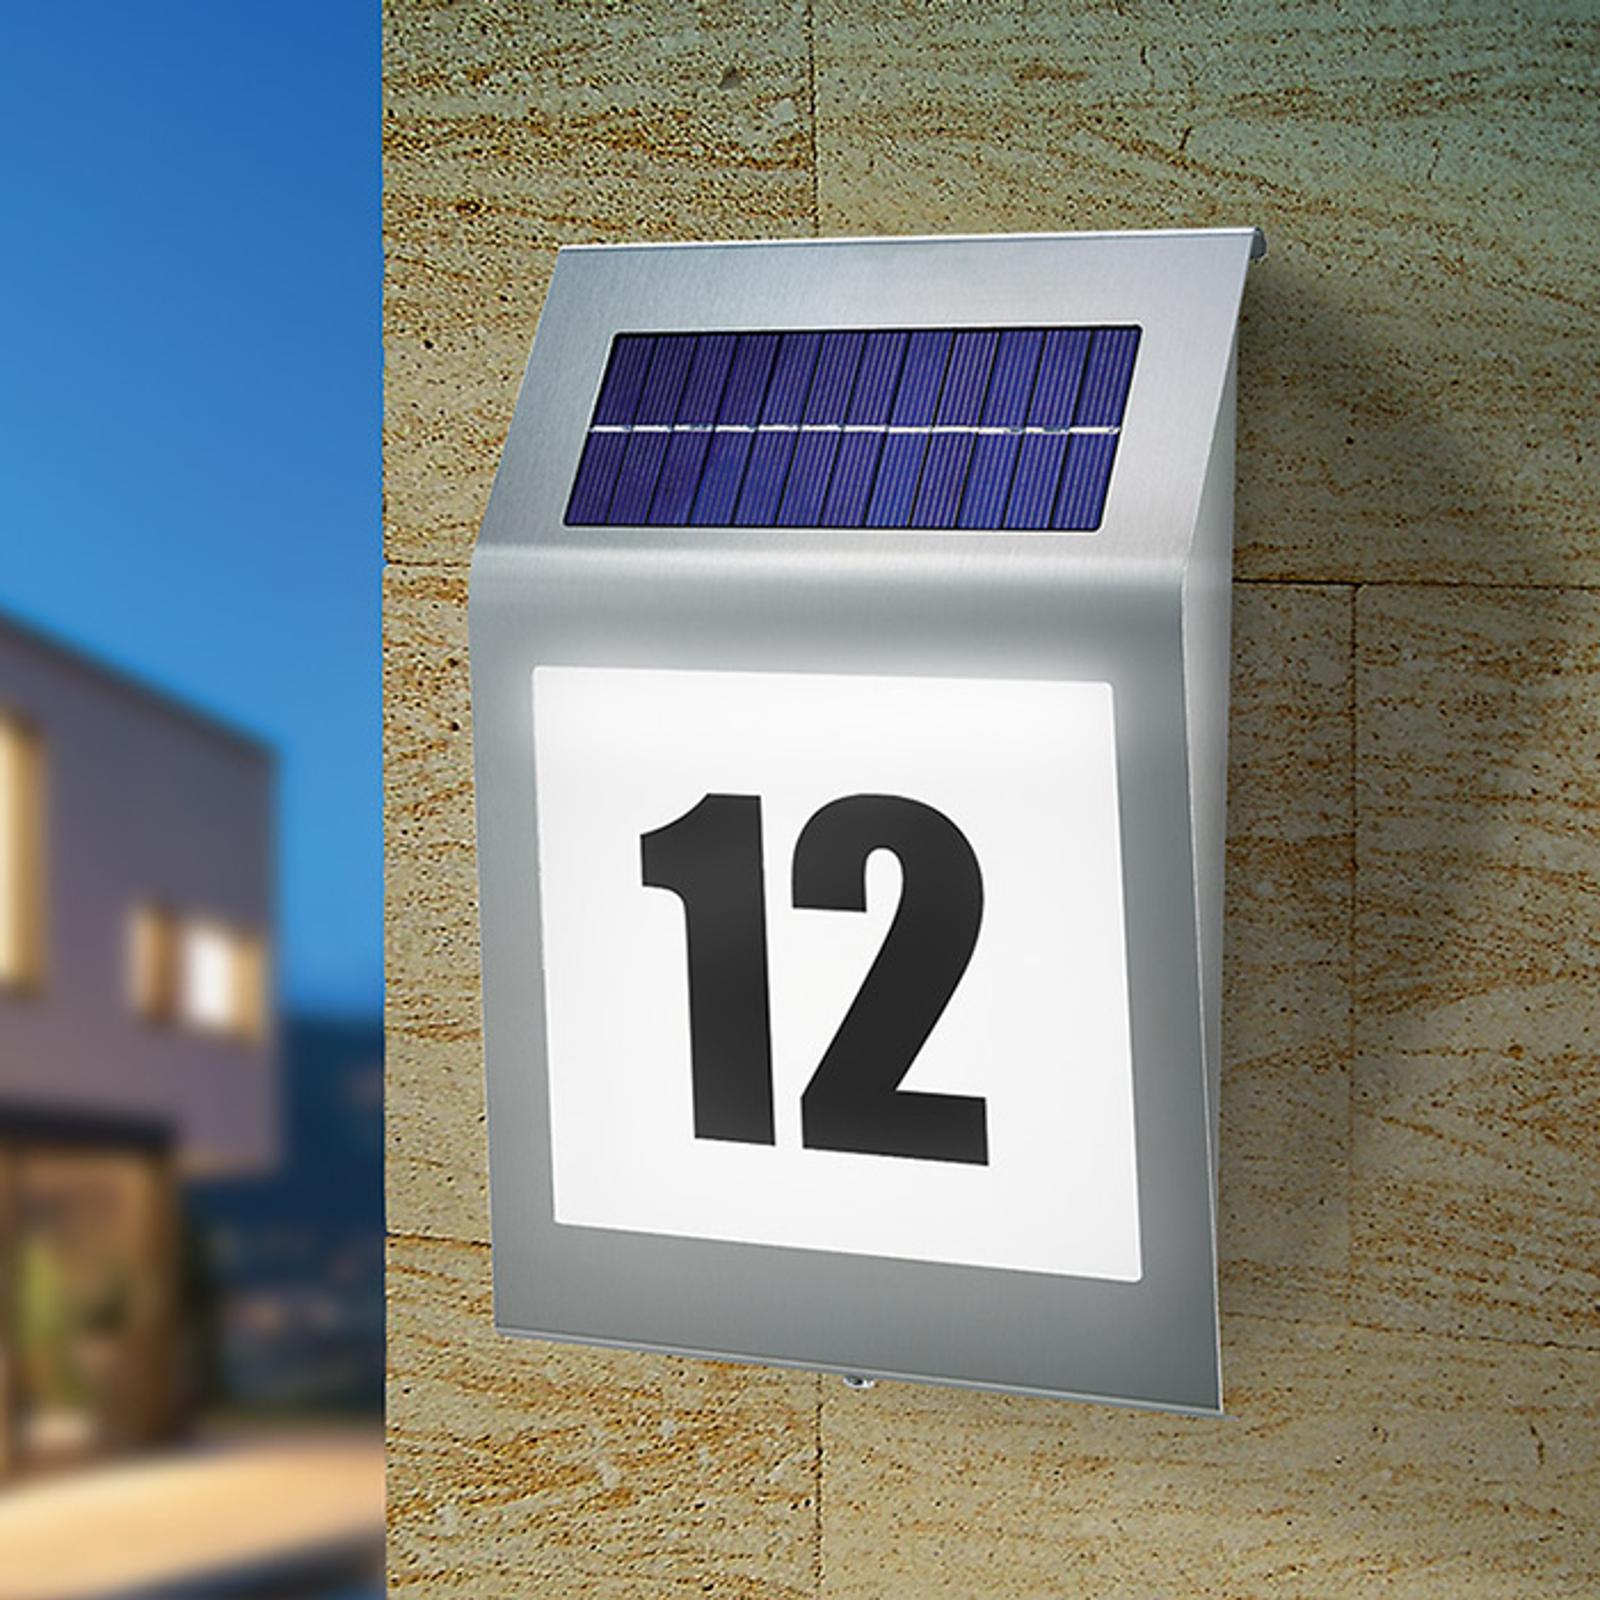 Style design huisnummerlamp op zonne-energie